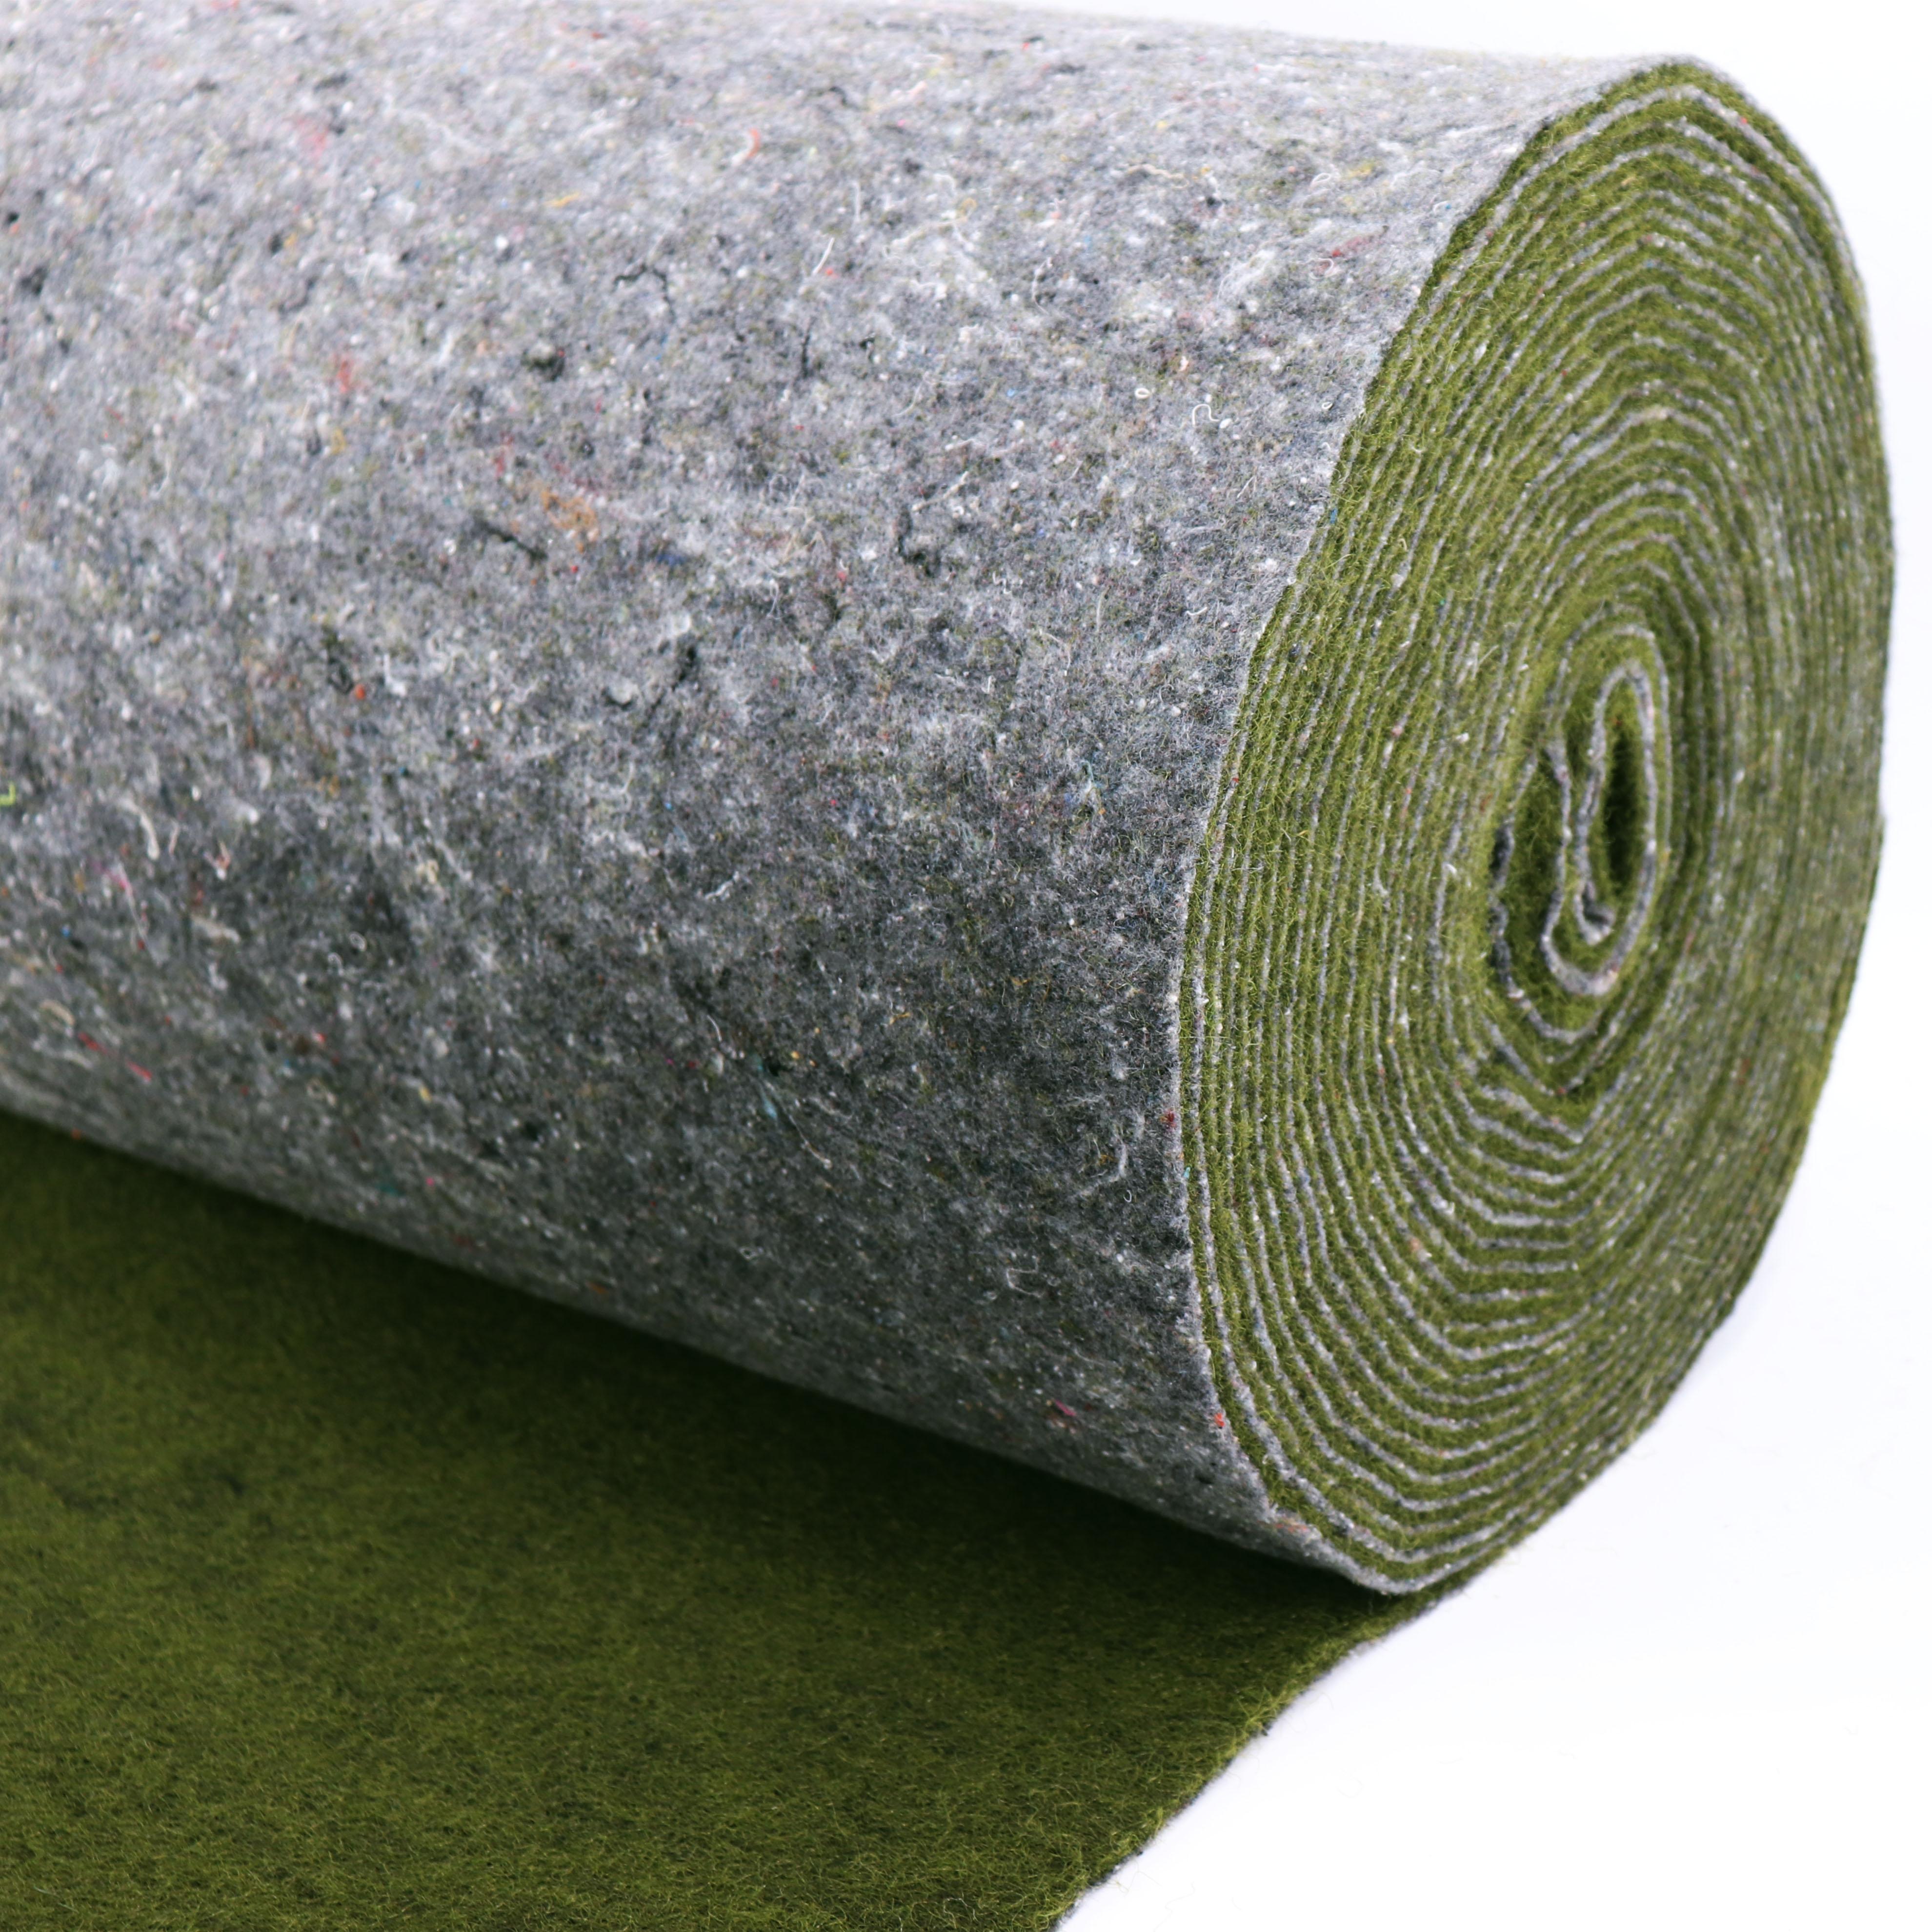 25m Ufermatte grün 0,5m breit Böschungsmatte Böschungsvlies Teichrand Teichfolie